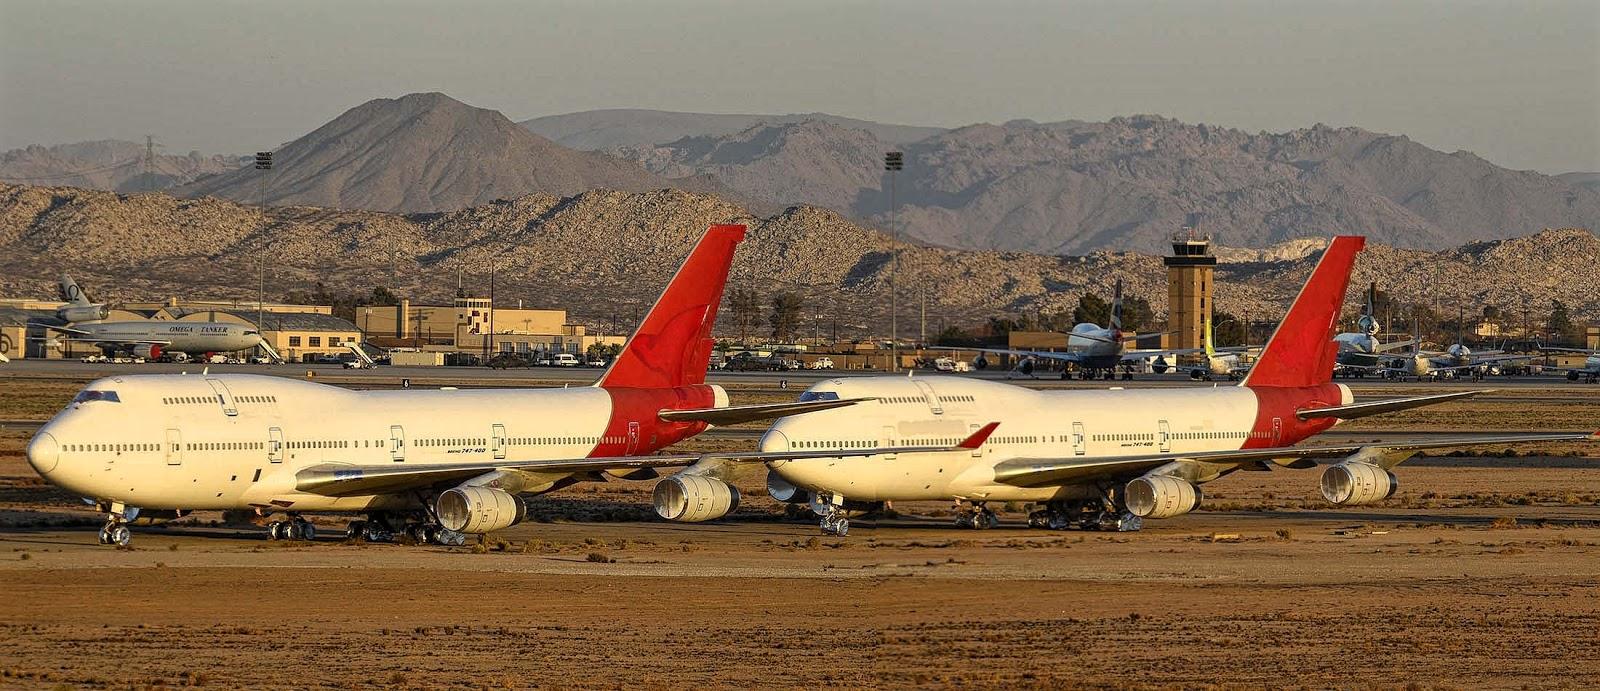 b747-400 qantas mojave desert aircraft graveyard